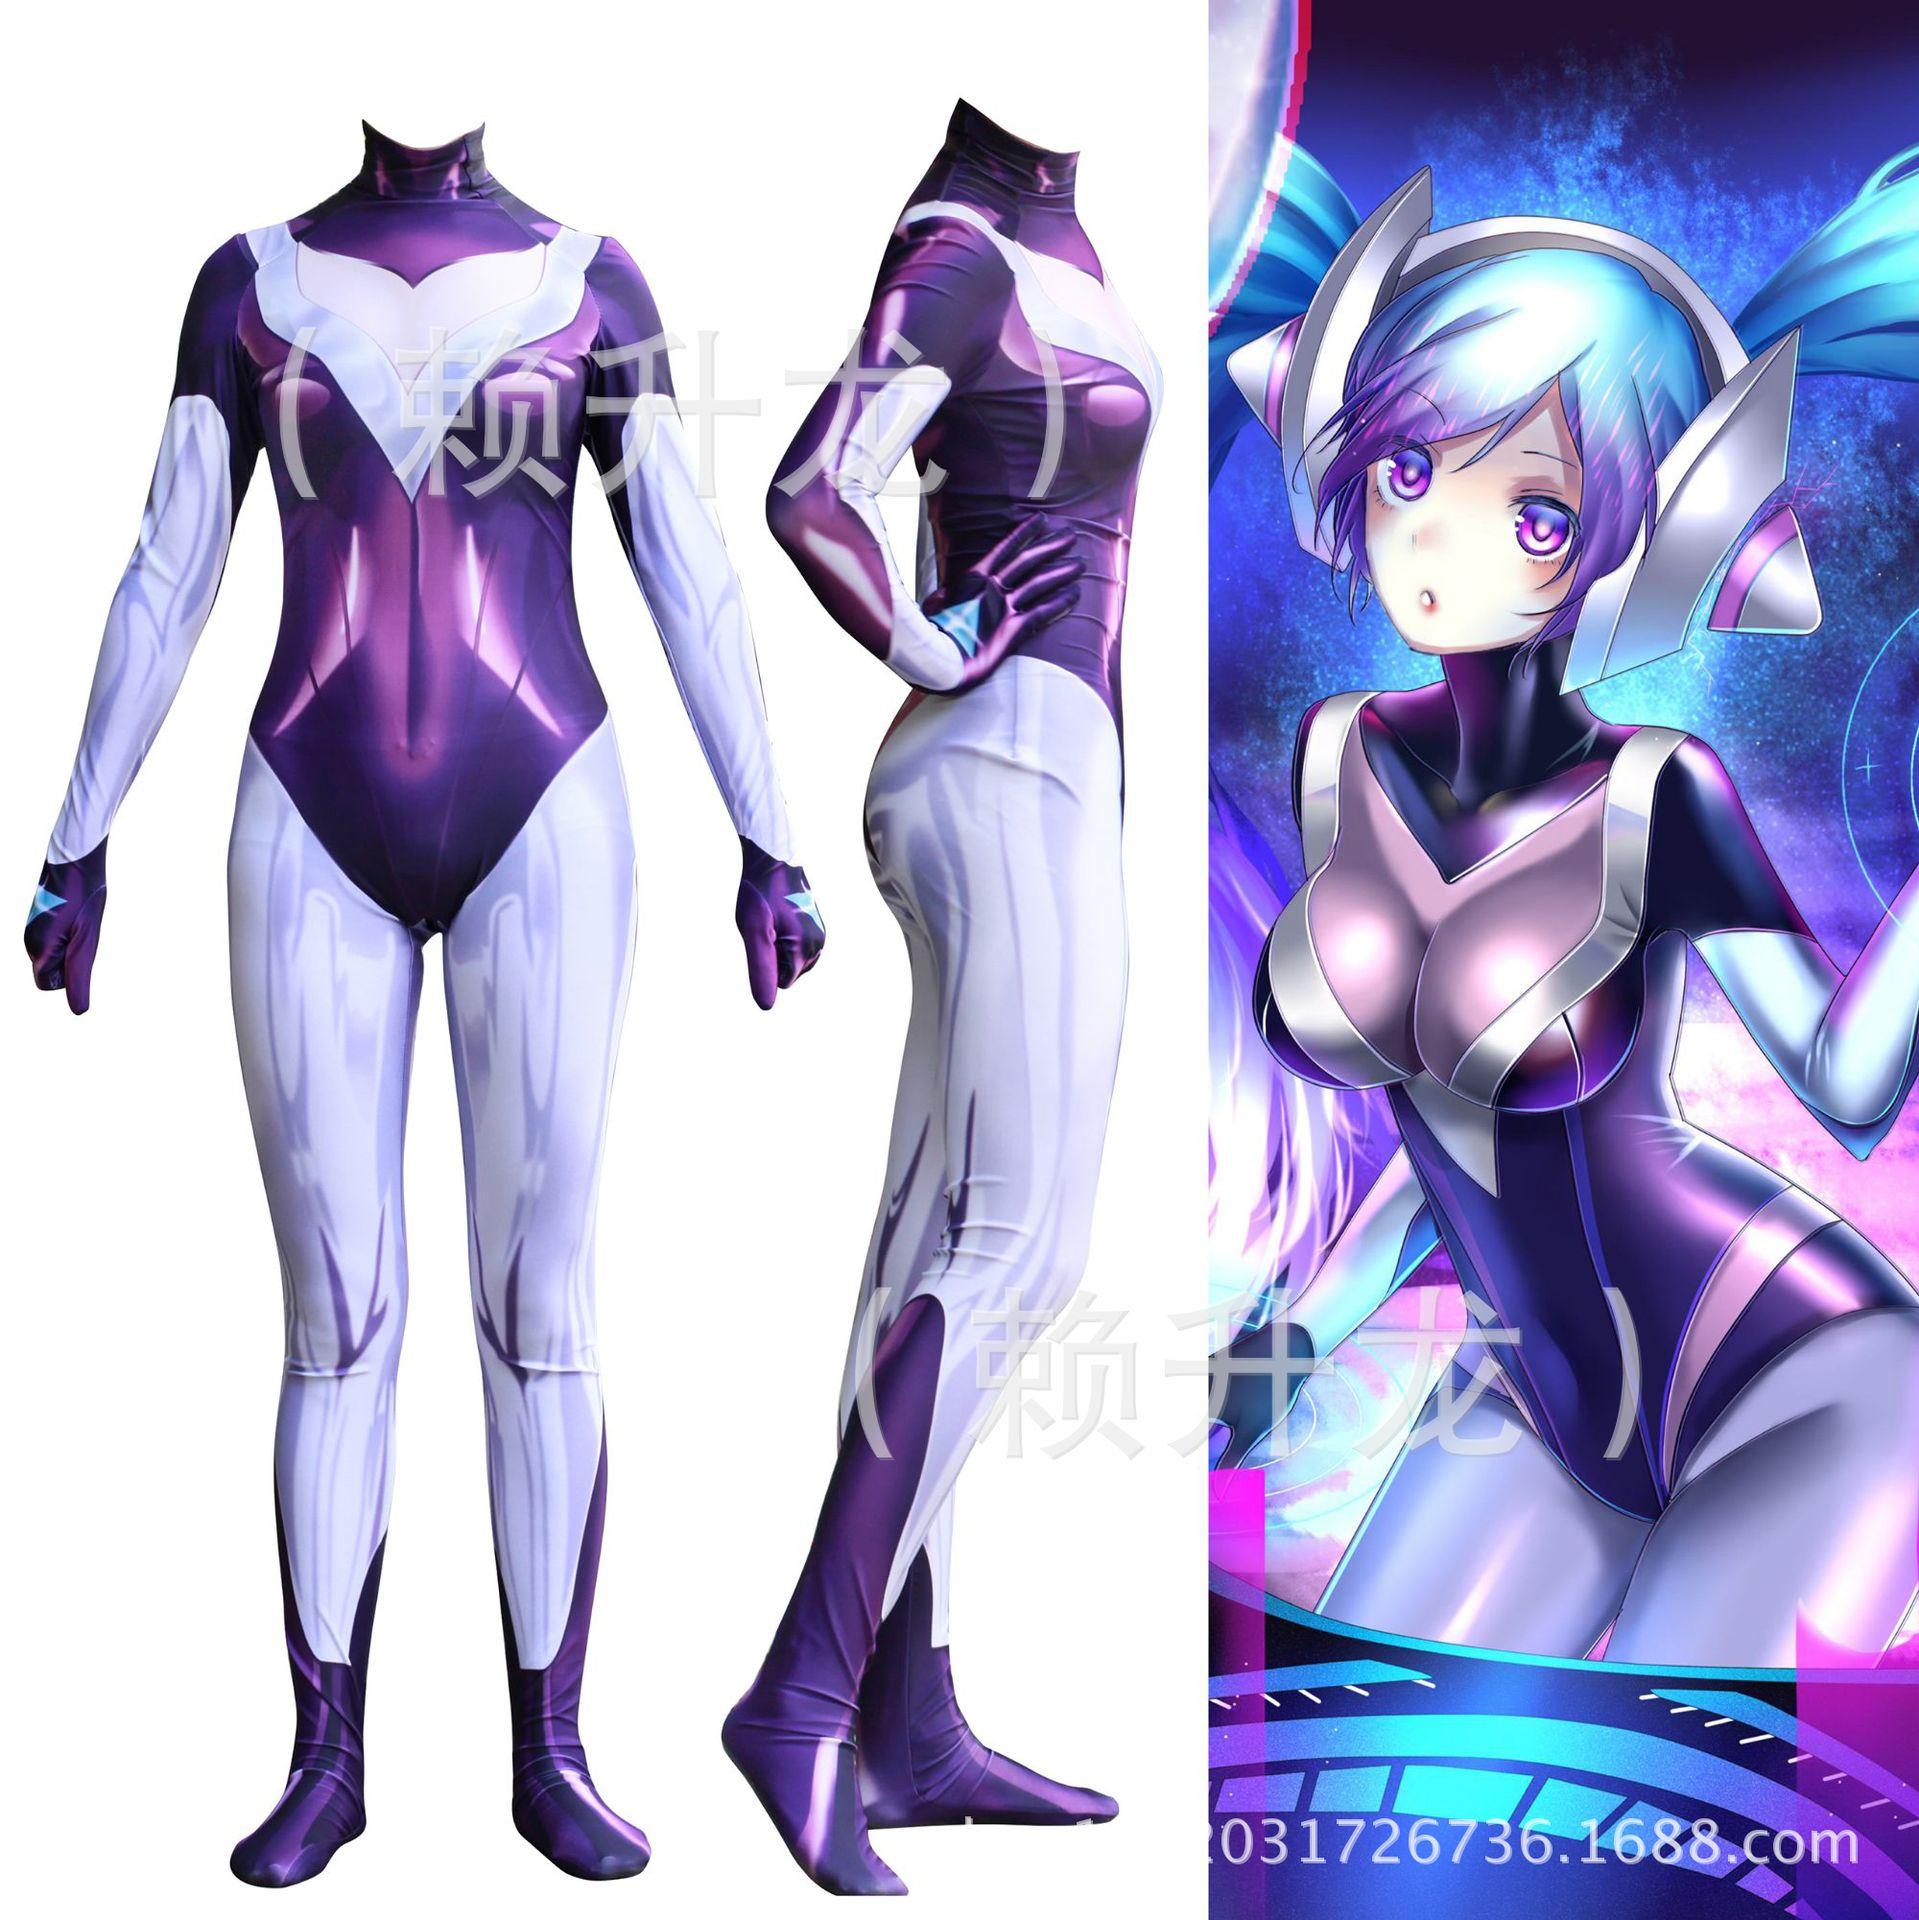 3D spot hero League custom Cosplay role play bodysuit digital Z06